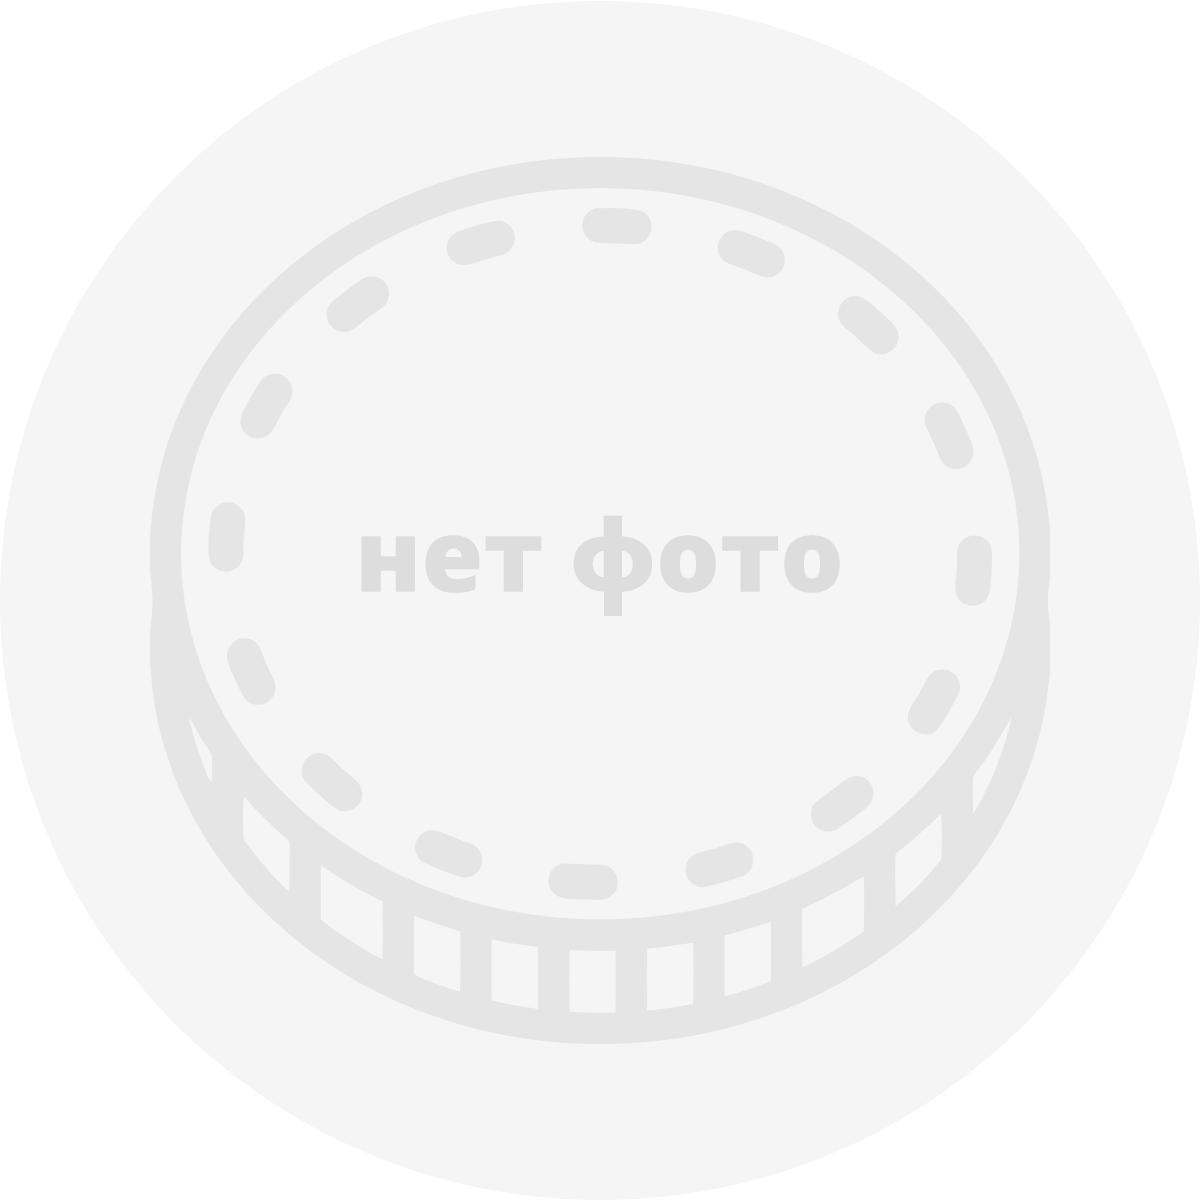 Нагорный Карабах, Набор монет (2013 г.)